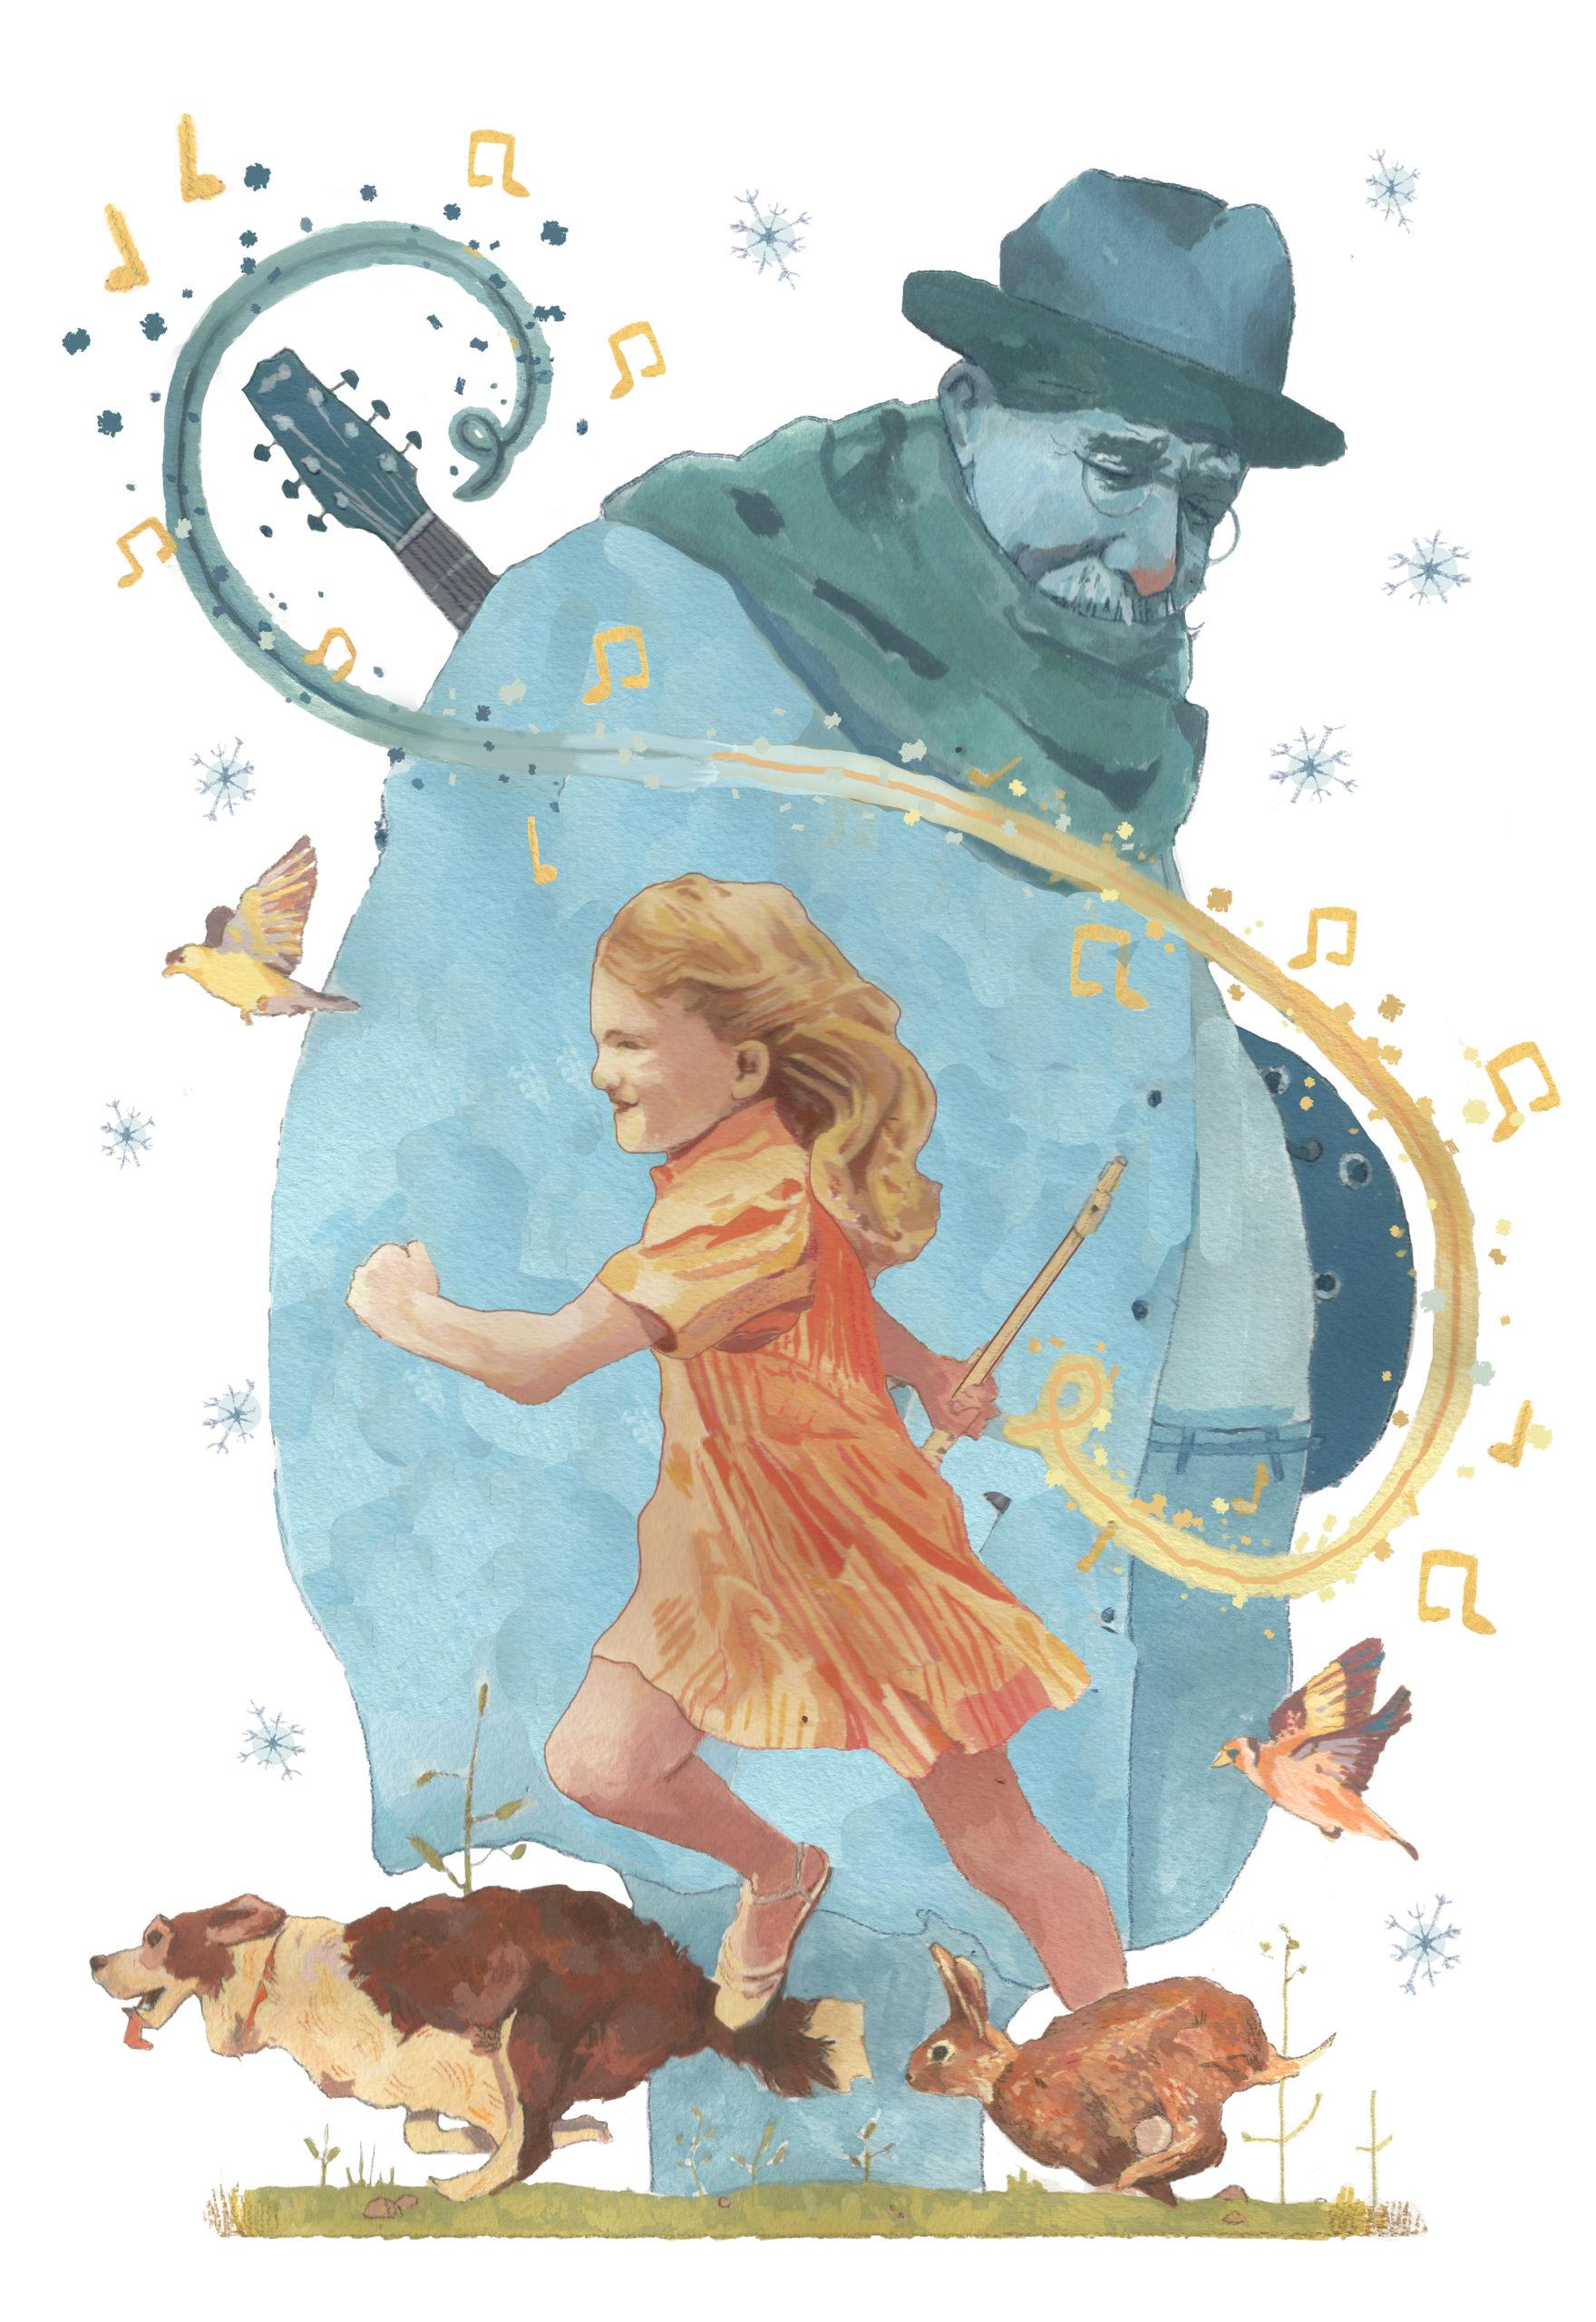 Vivaldi Four Seasons student artwork from MassArt, Sarah Egan